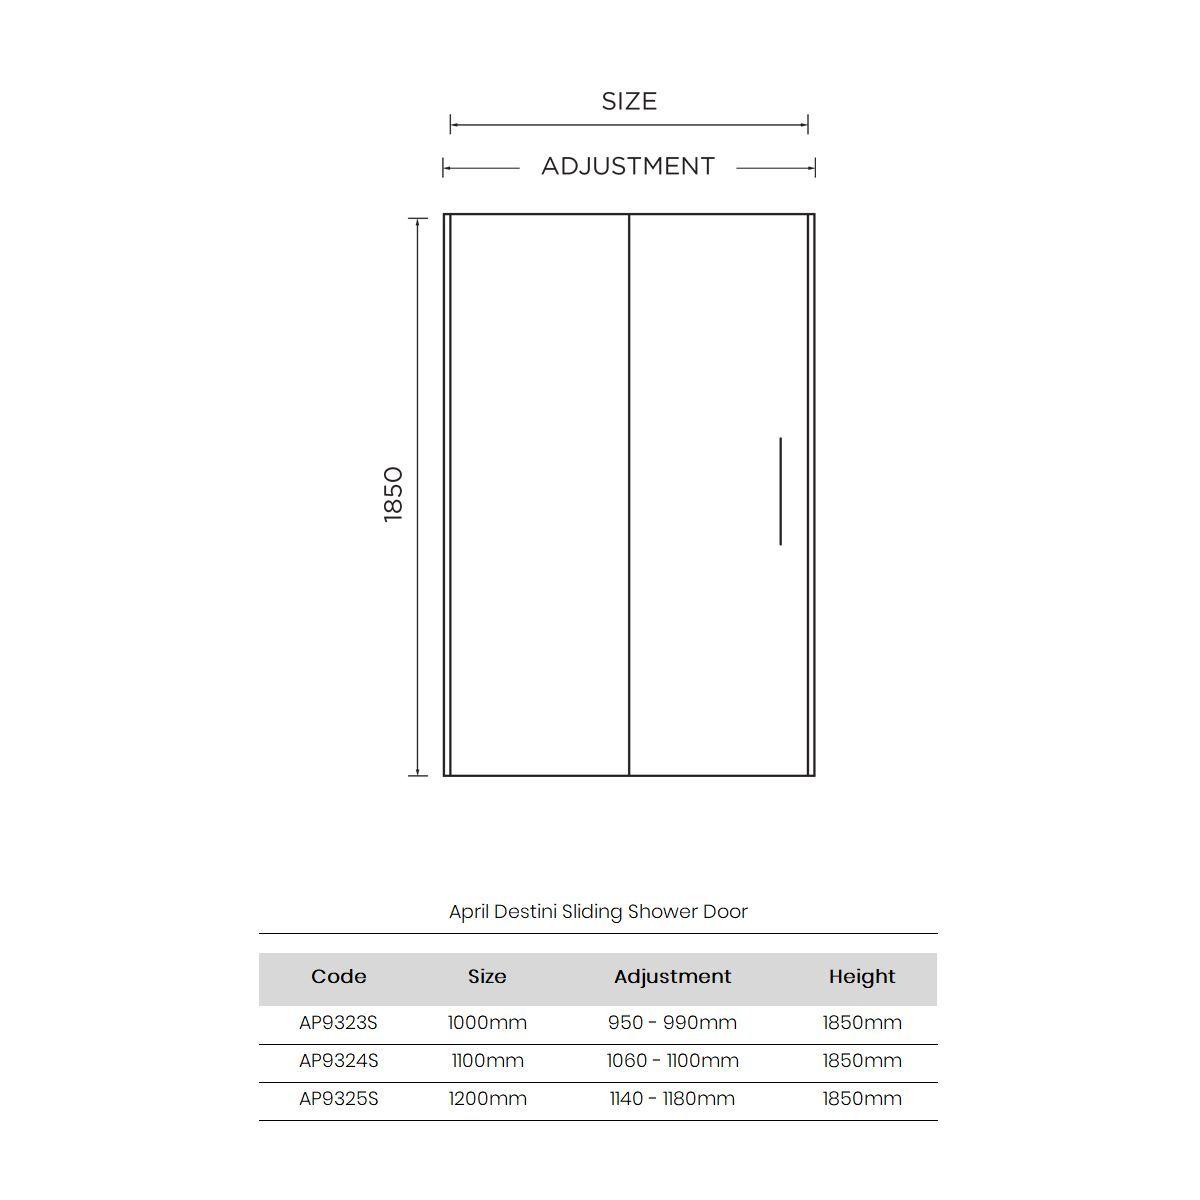 April Destini Sliding Shower Door with Optional Side Panel Dimensions